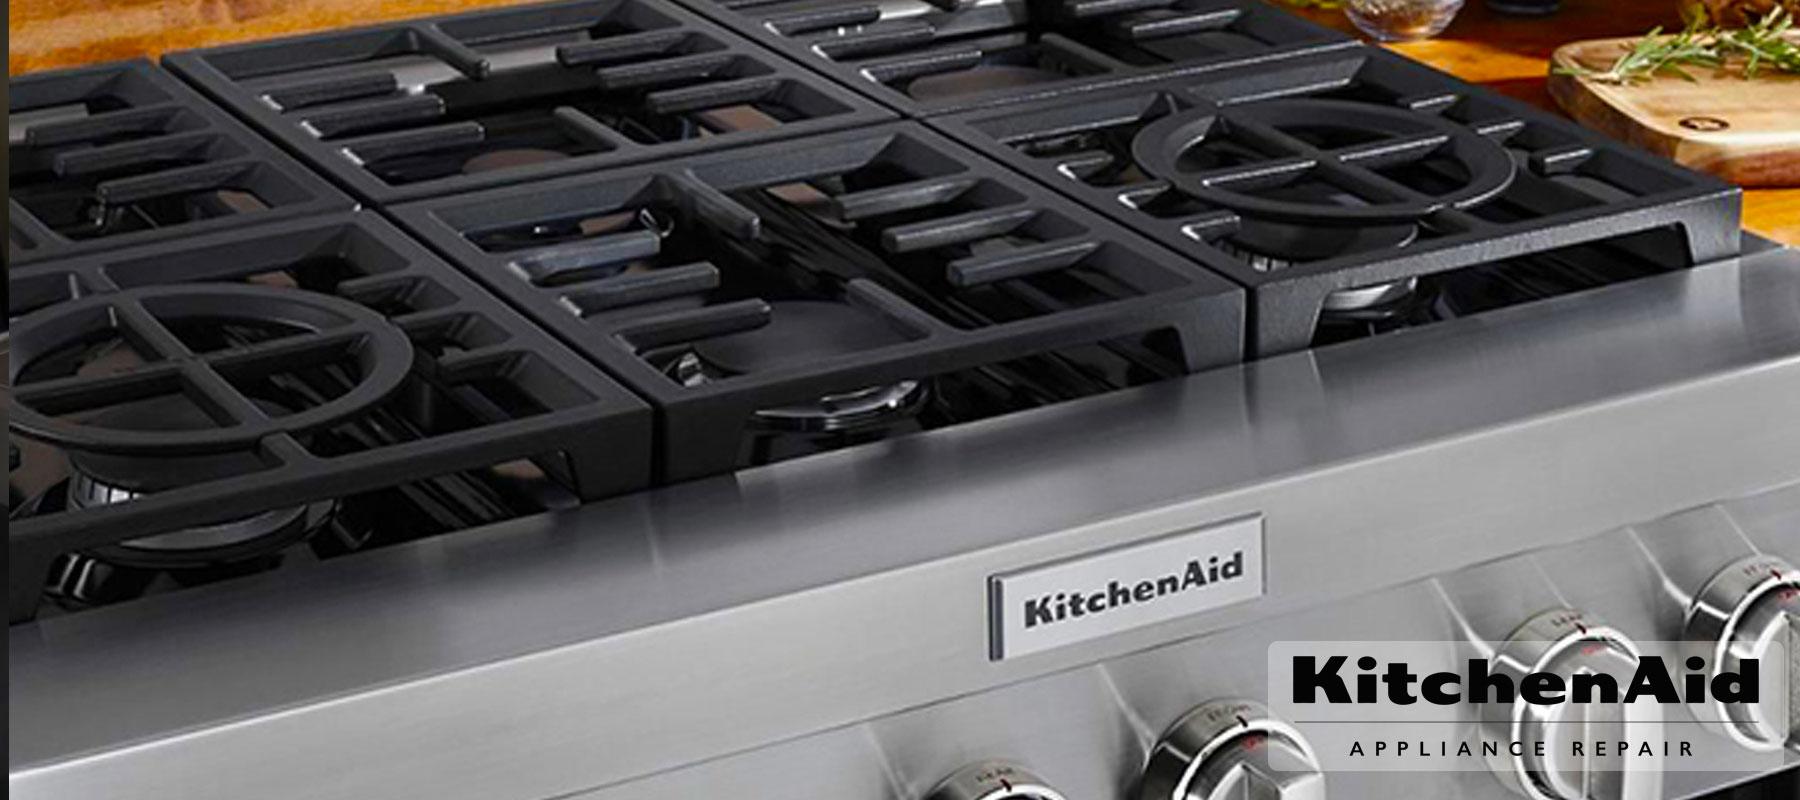 Troubleshooting KitchenAid Range Tops   Kitchenaid Appliance Repair Pros